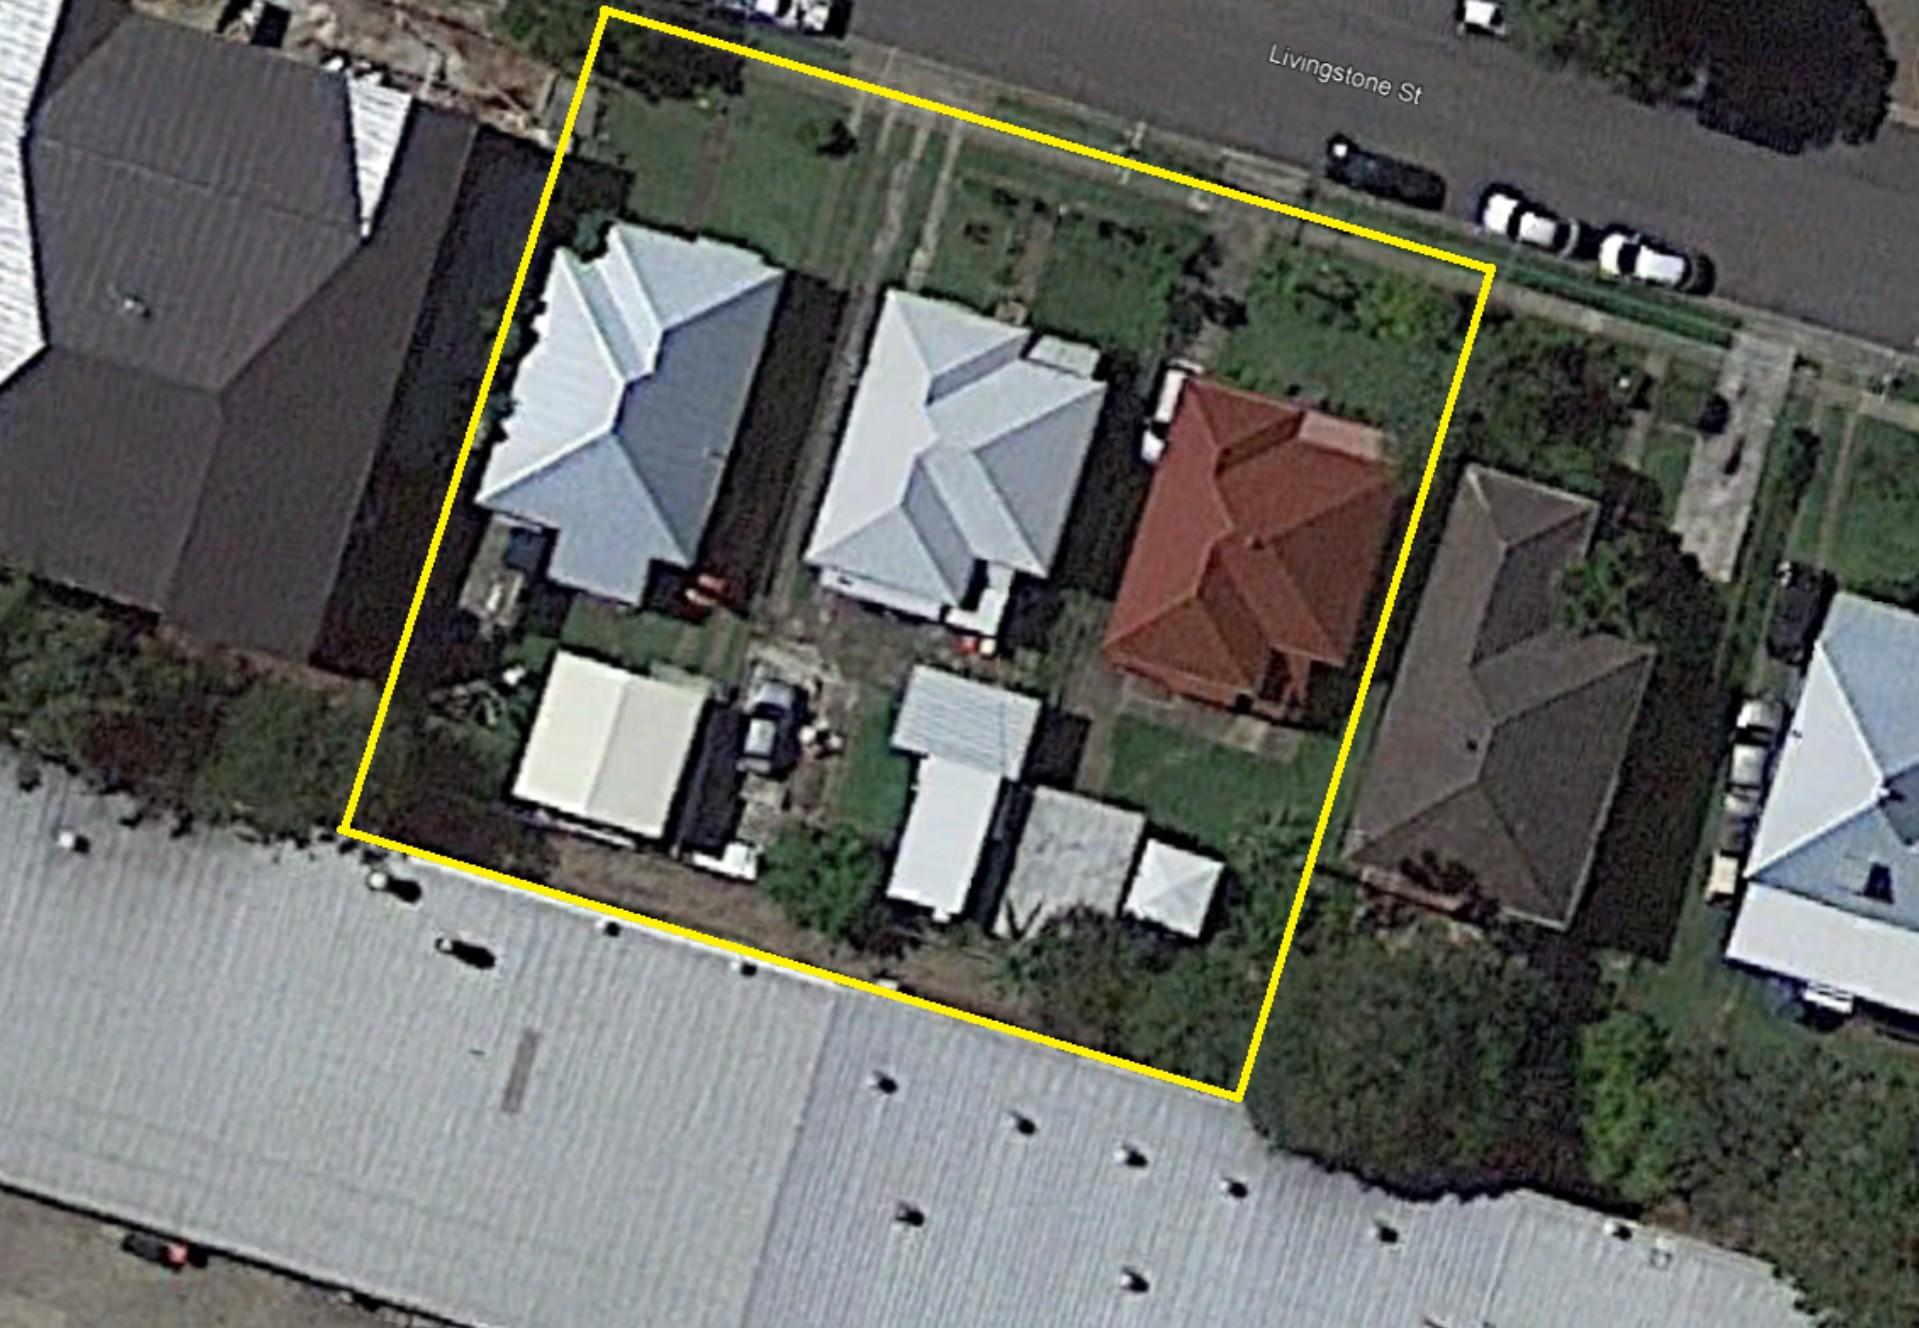 11-17 Livingston Street Yeerongpilly QLD 4105